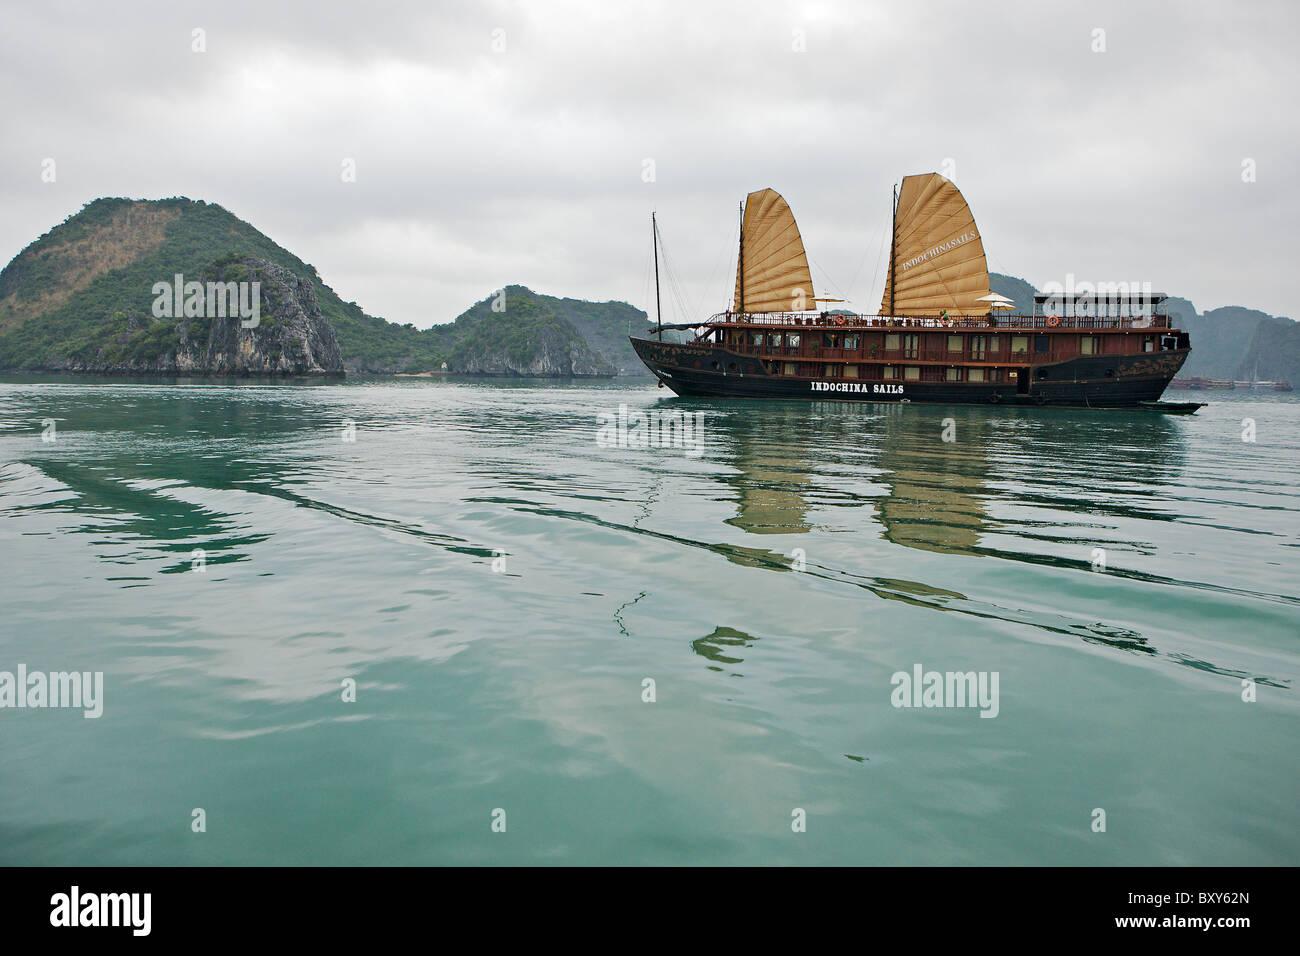 Junk in Halong Bay, north Vietnam - Stock Image